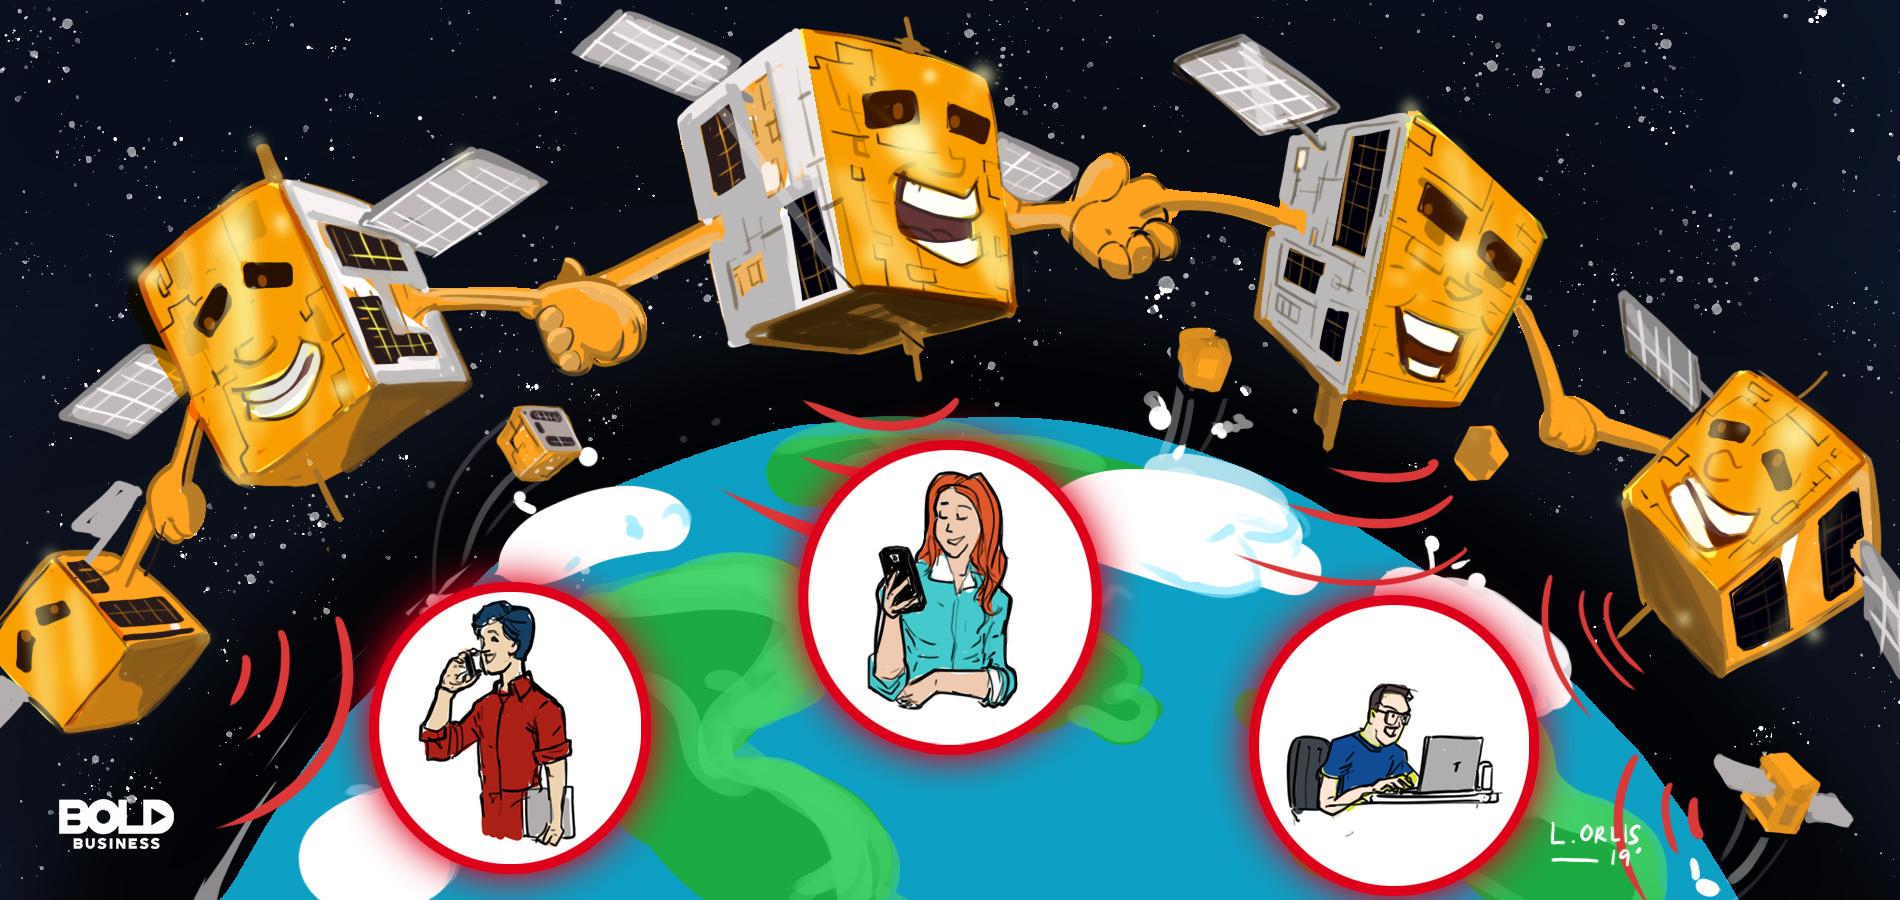 cartoon of small satellites emerging beside big satellites orbiting around the earth